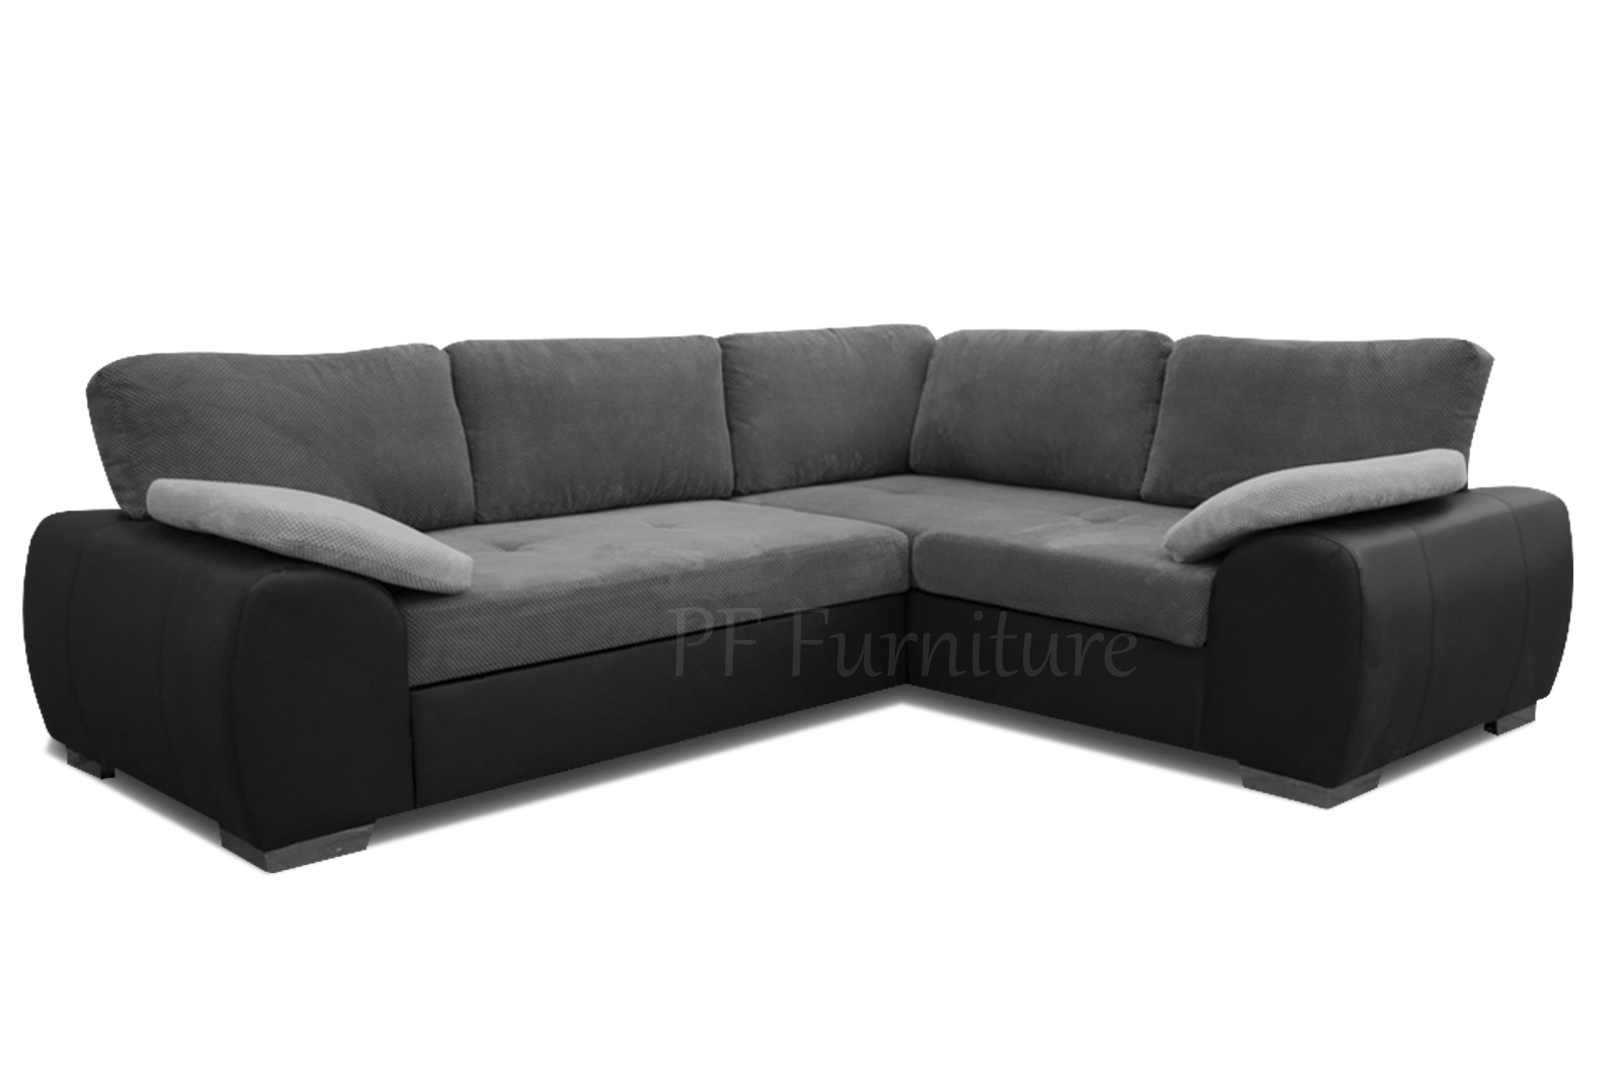 Picture of: Enduro Corner Sofa Bed Pf Furniture